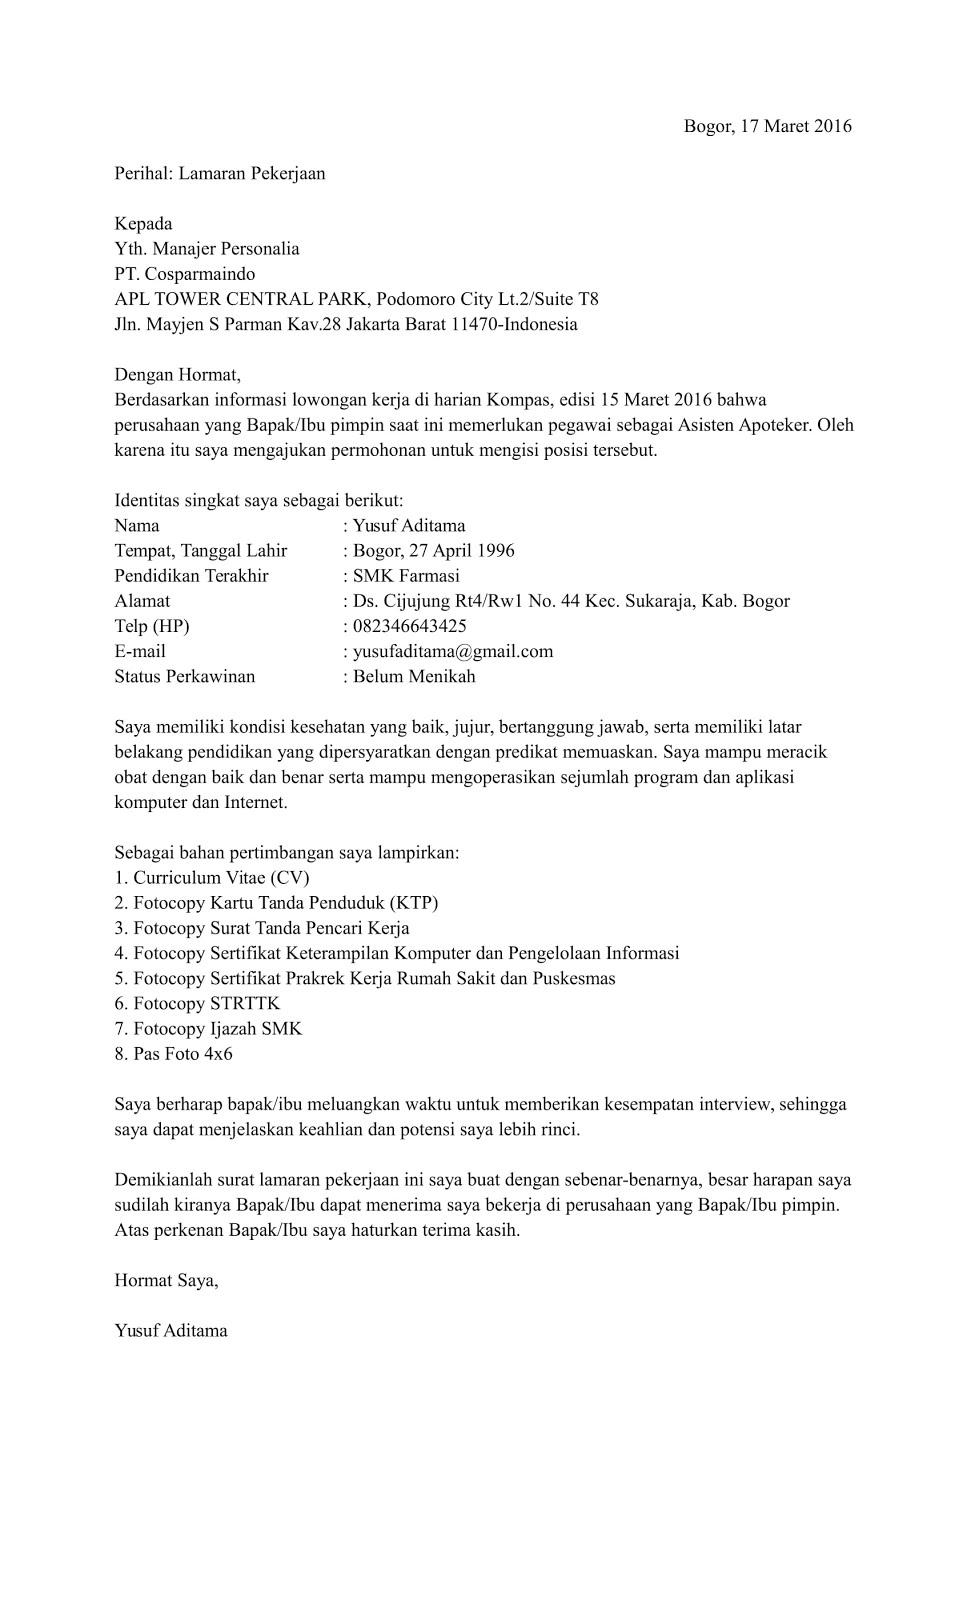 7 Contoh Surat Lamaran Kerja Asisten Apoteker Terbaru Guild Jobs